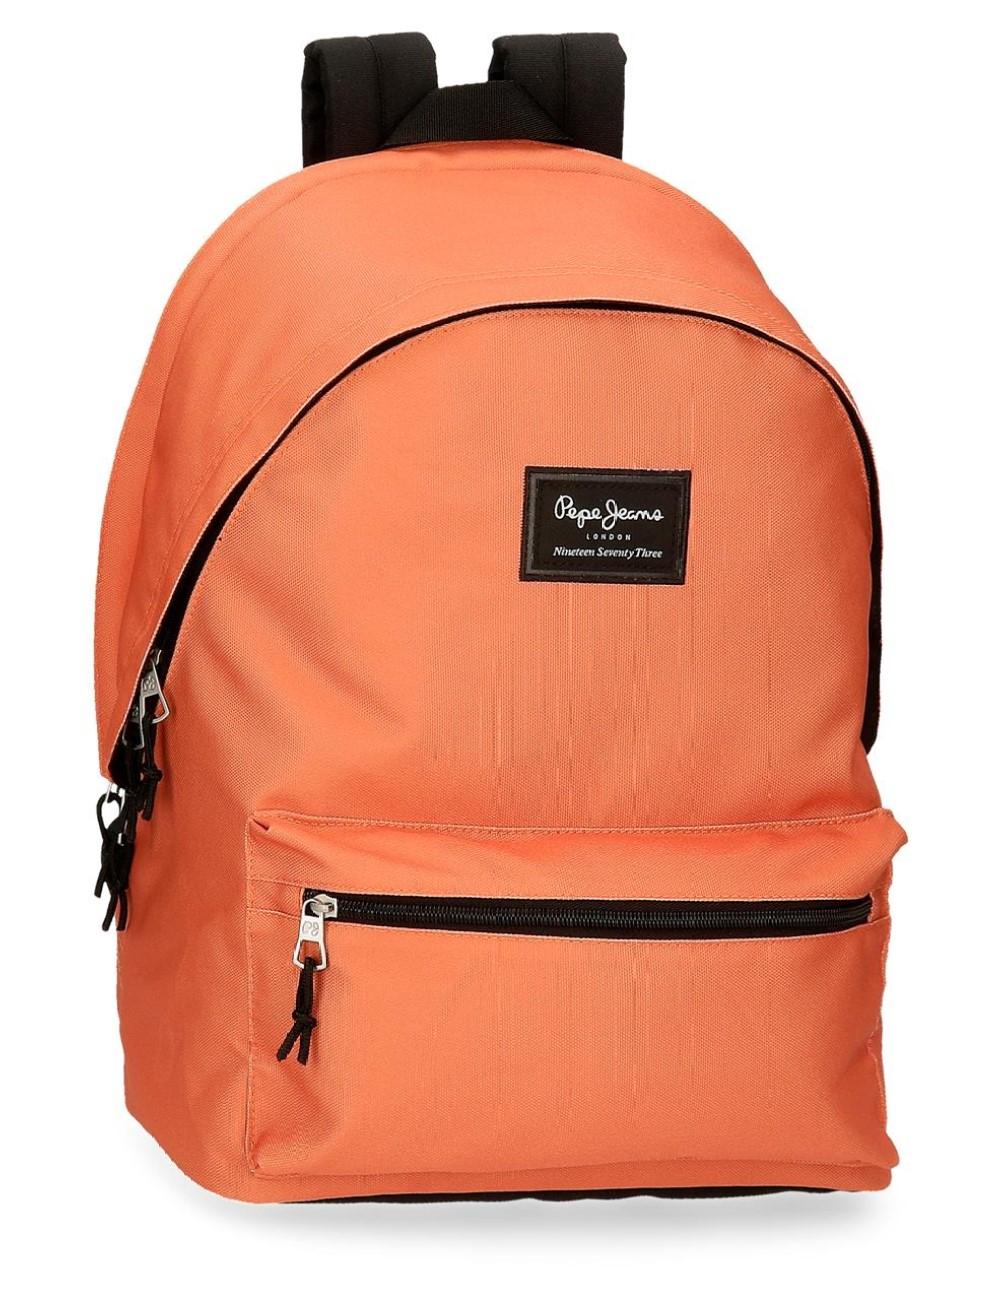 Mochila Doble Compartimento Portaordenador Pepe Jeans Aris Naranja 6332429